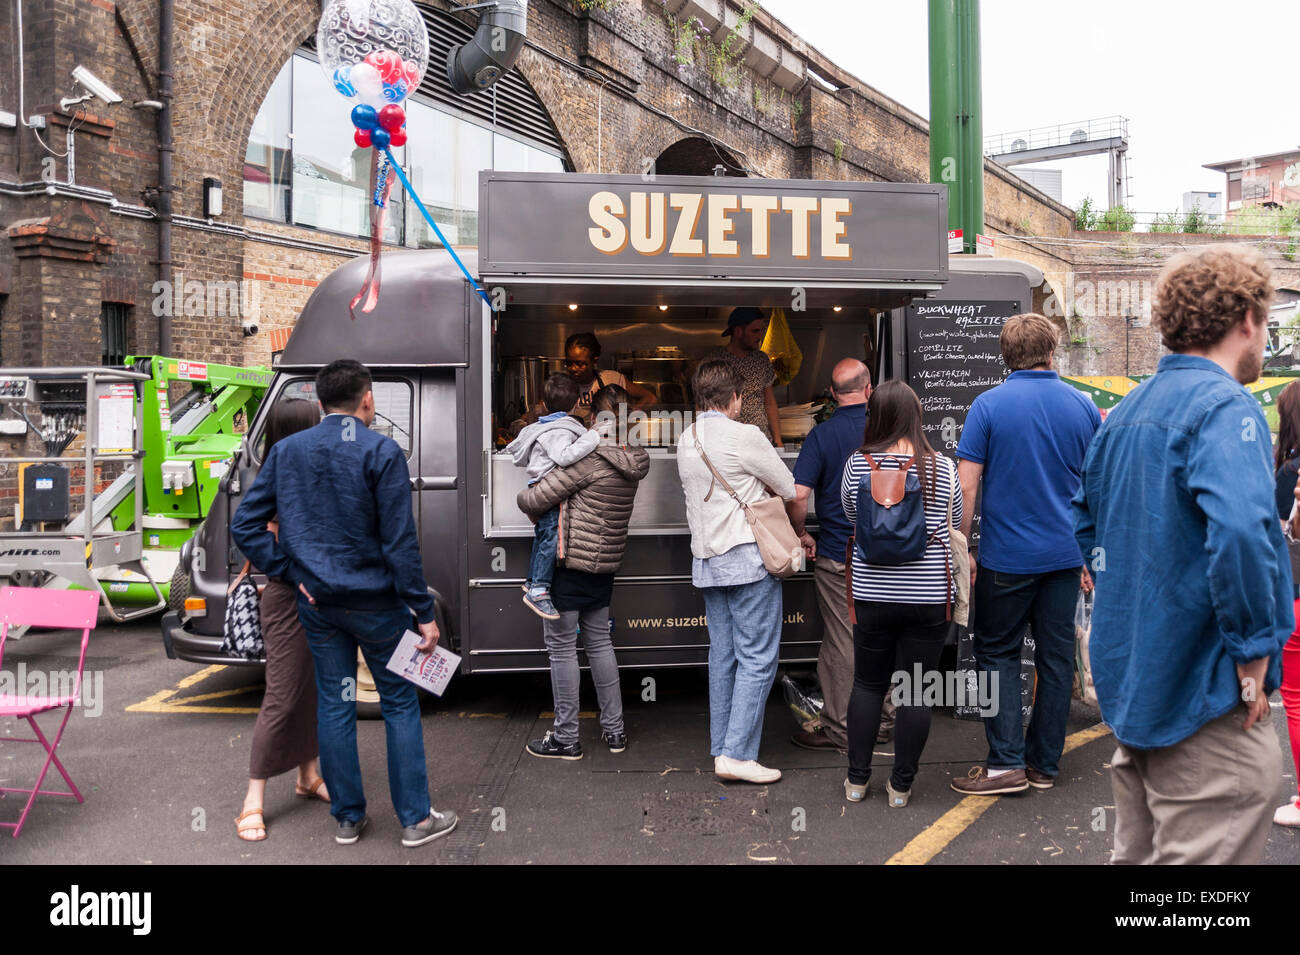 London, UK  12 July 2015  Francophiles gather to enjoy the Bastille